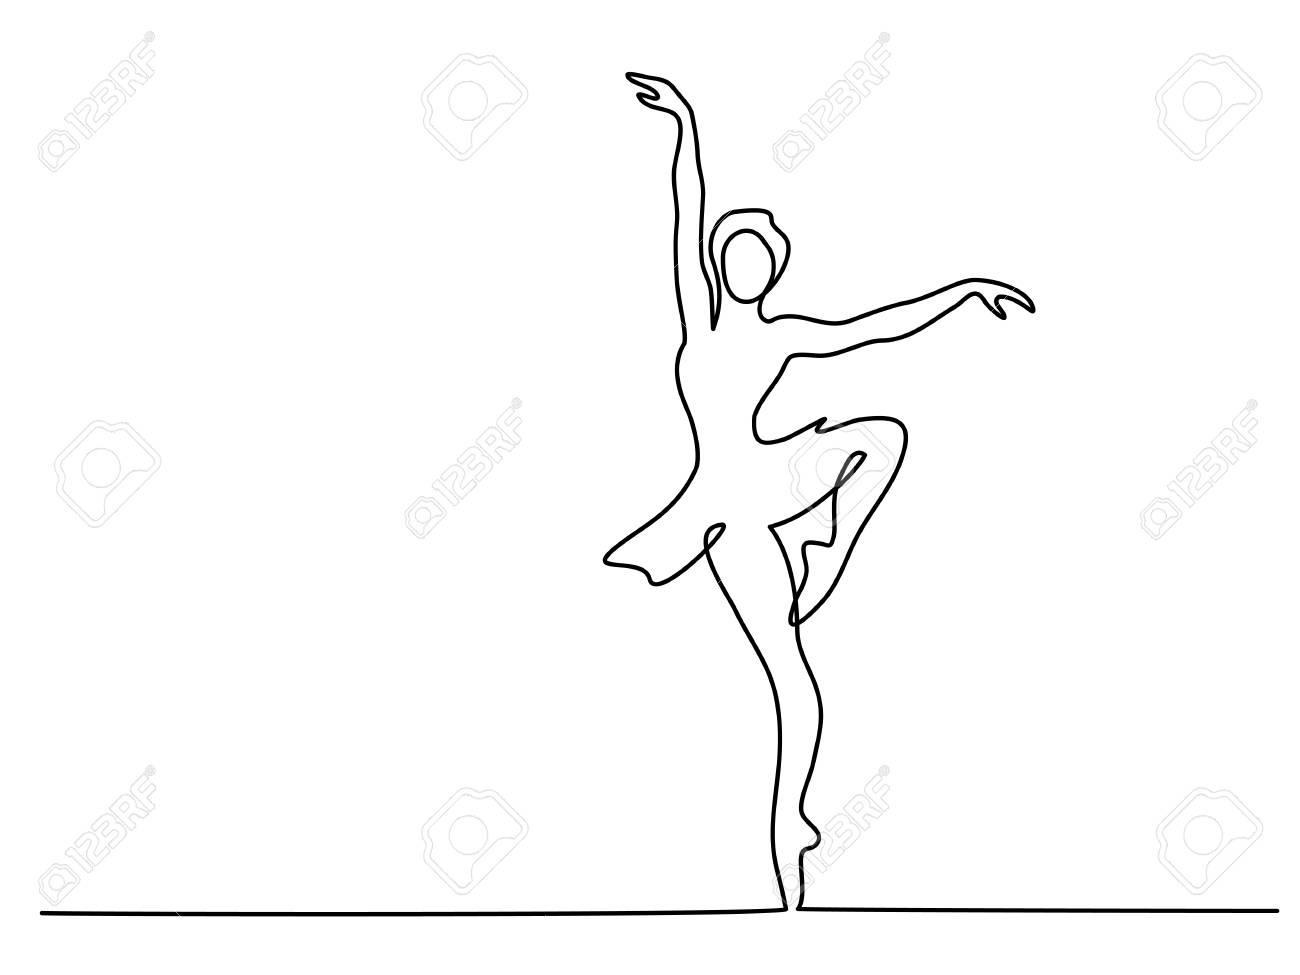 1300x975 Continuous Line Art Drawing. Ballet Dancer Ballerina. Vector